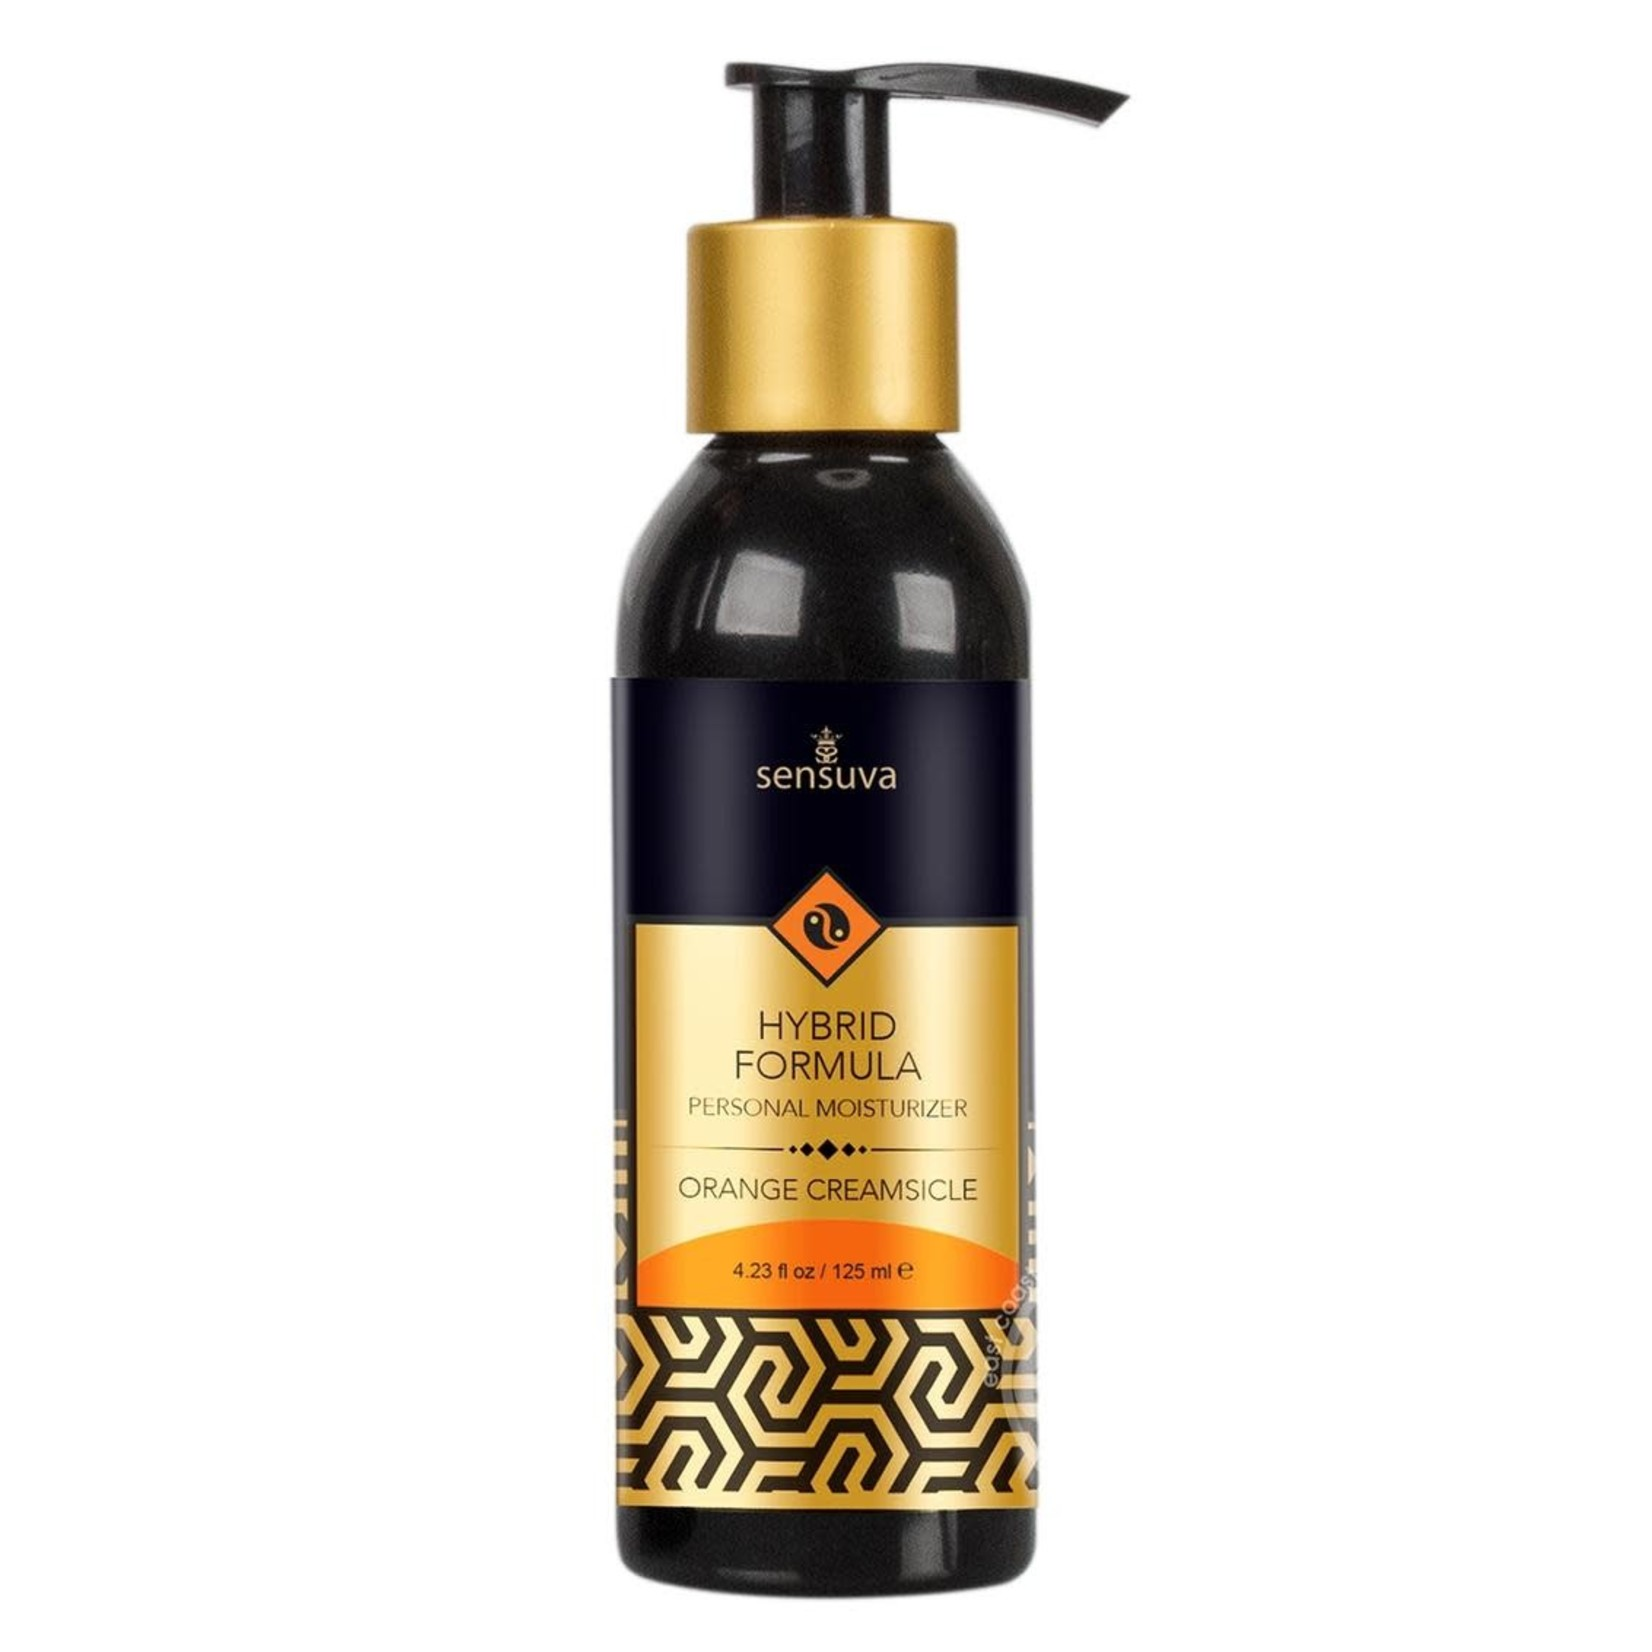 Hybrid Personal Moisturizer - Orange Creamsicle 4 fl. oz. Bottle